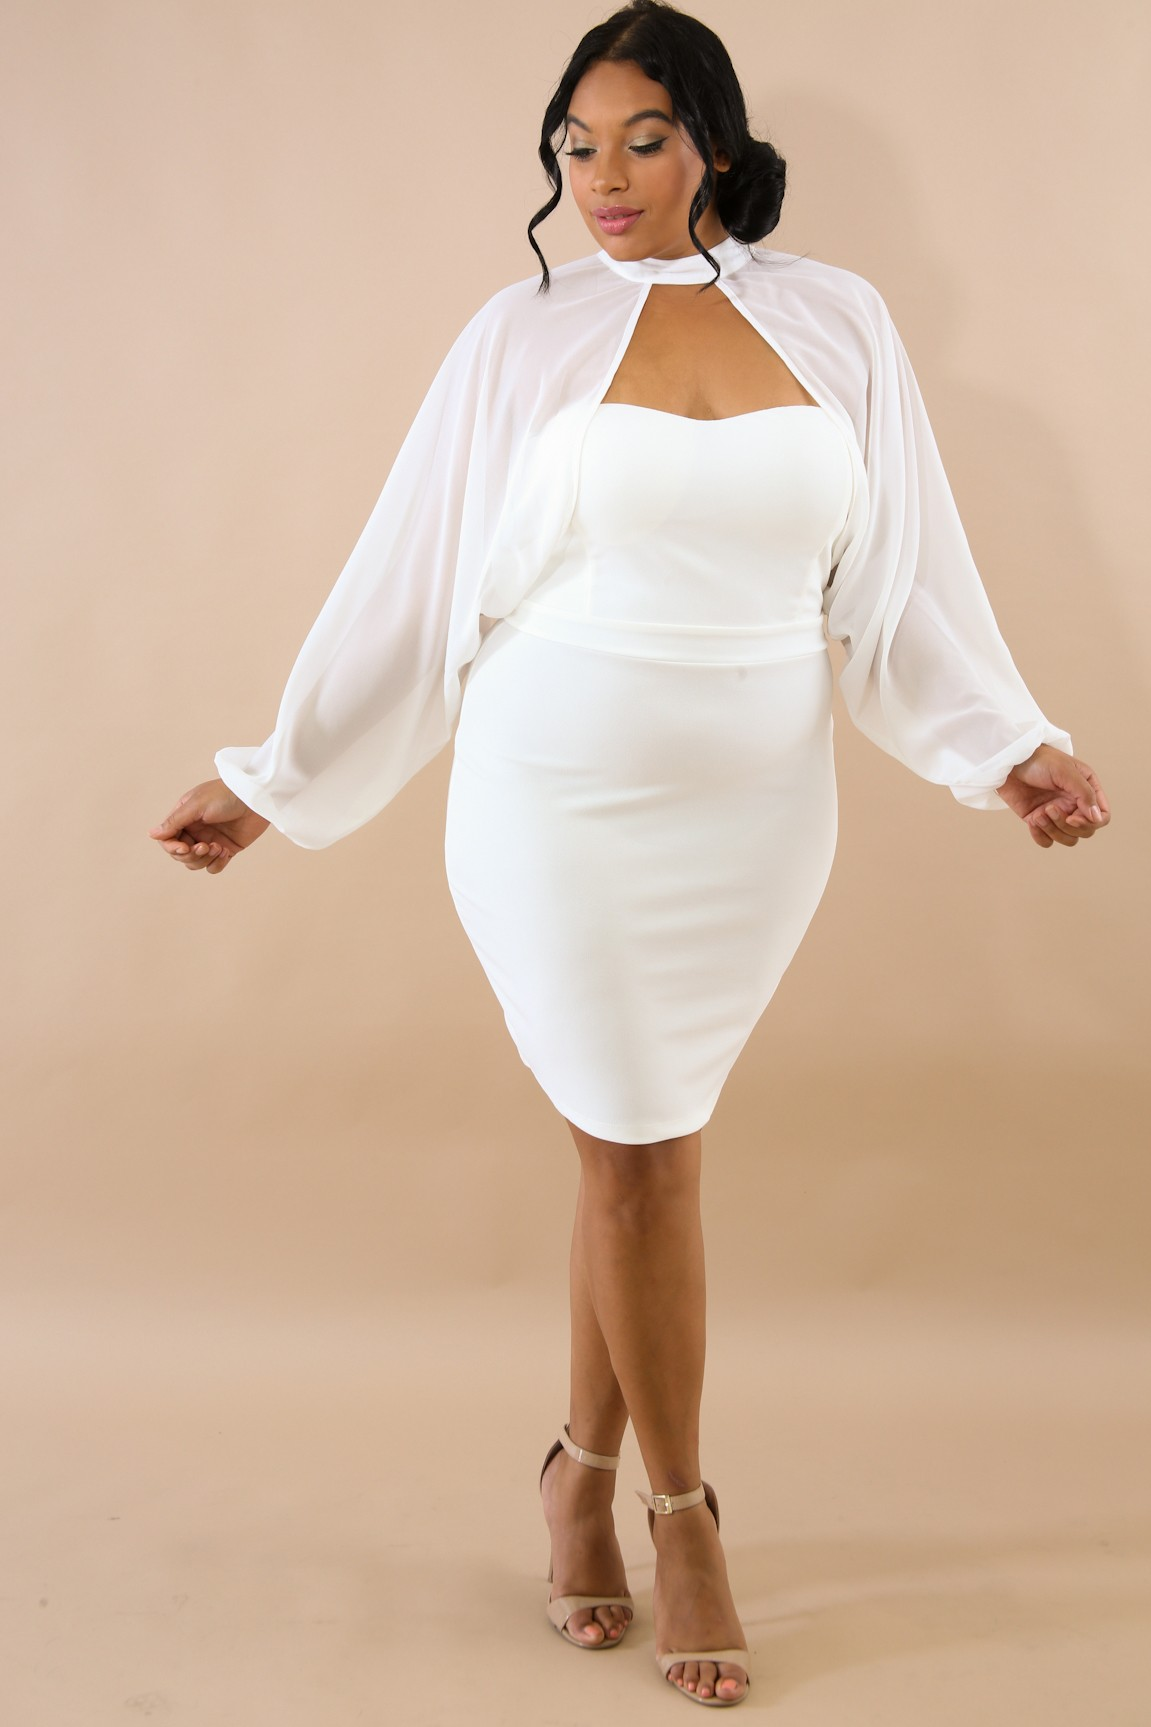 Sheer Sweetheart Choker Dress